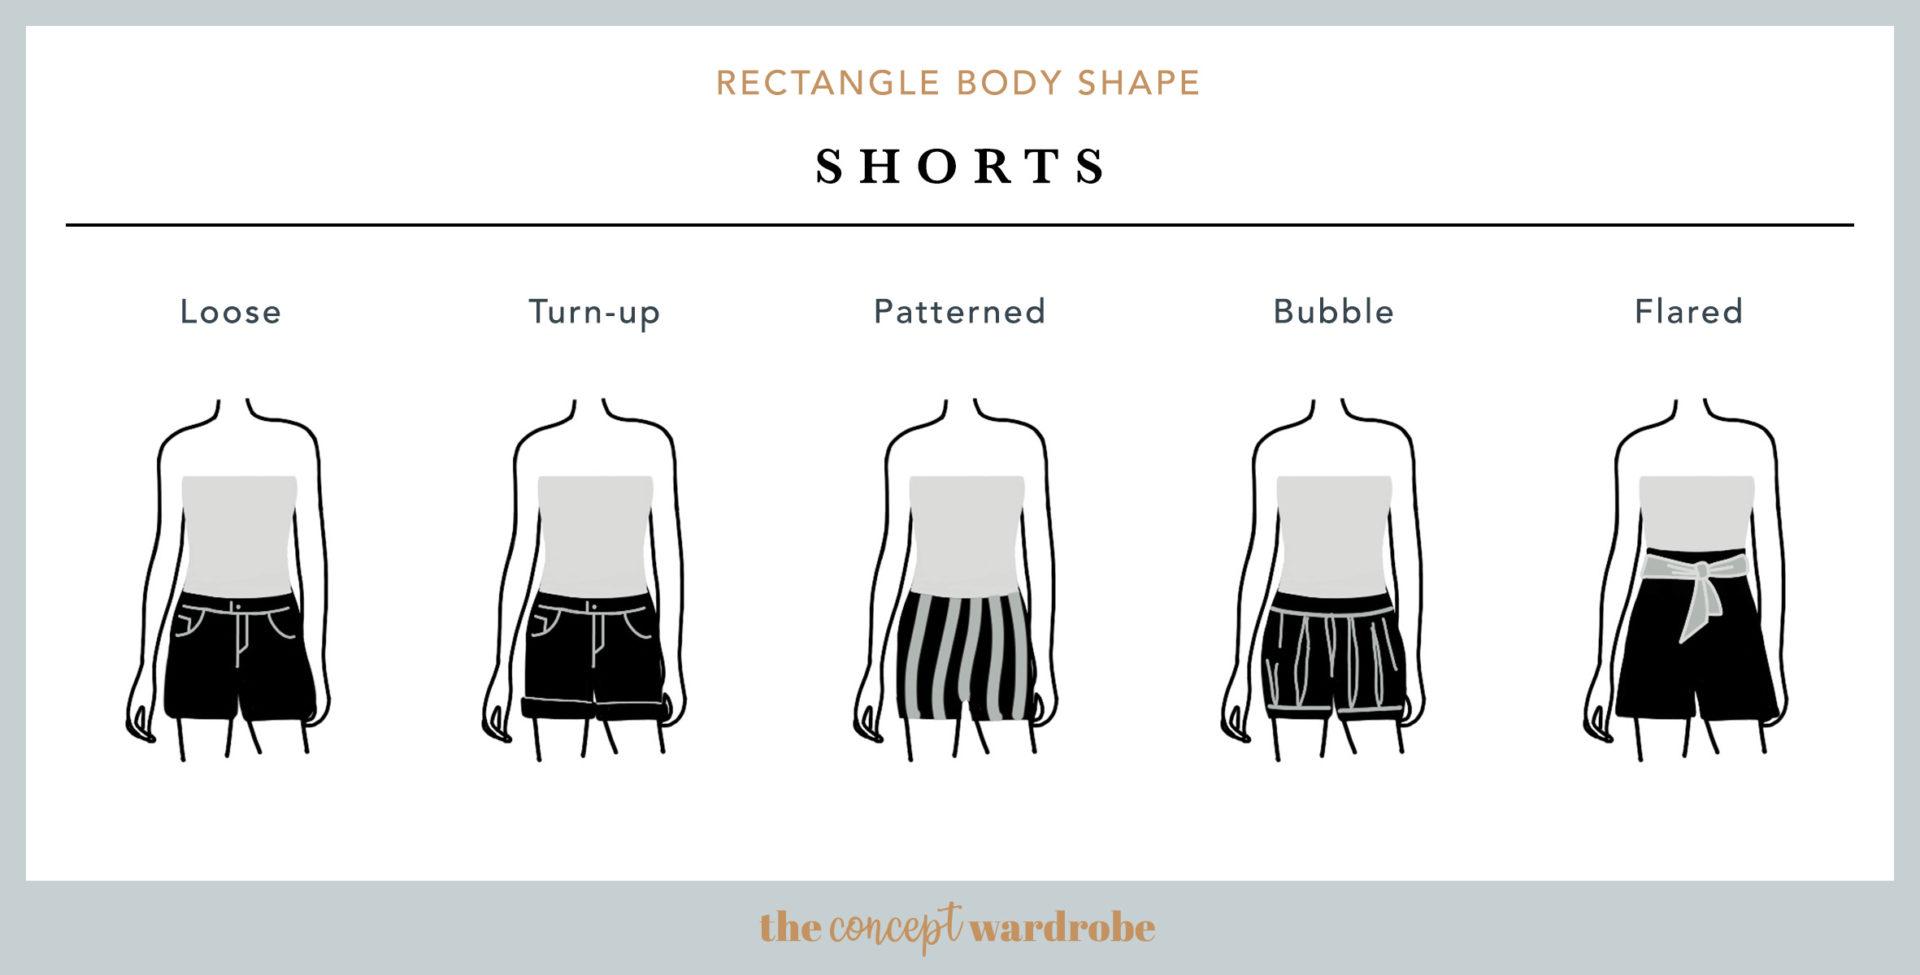 Rectangle Body Shape Shorts - the concept wardrobe